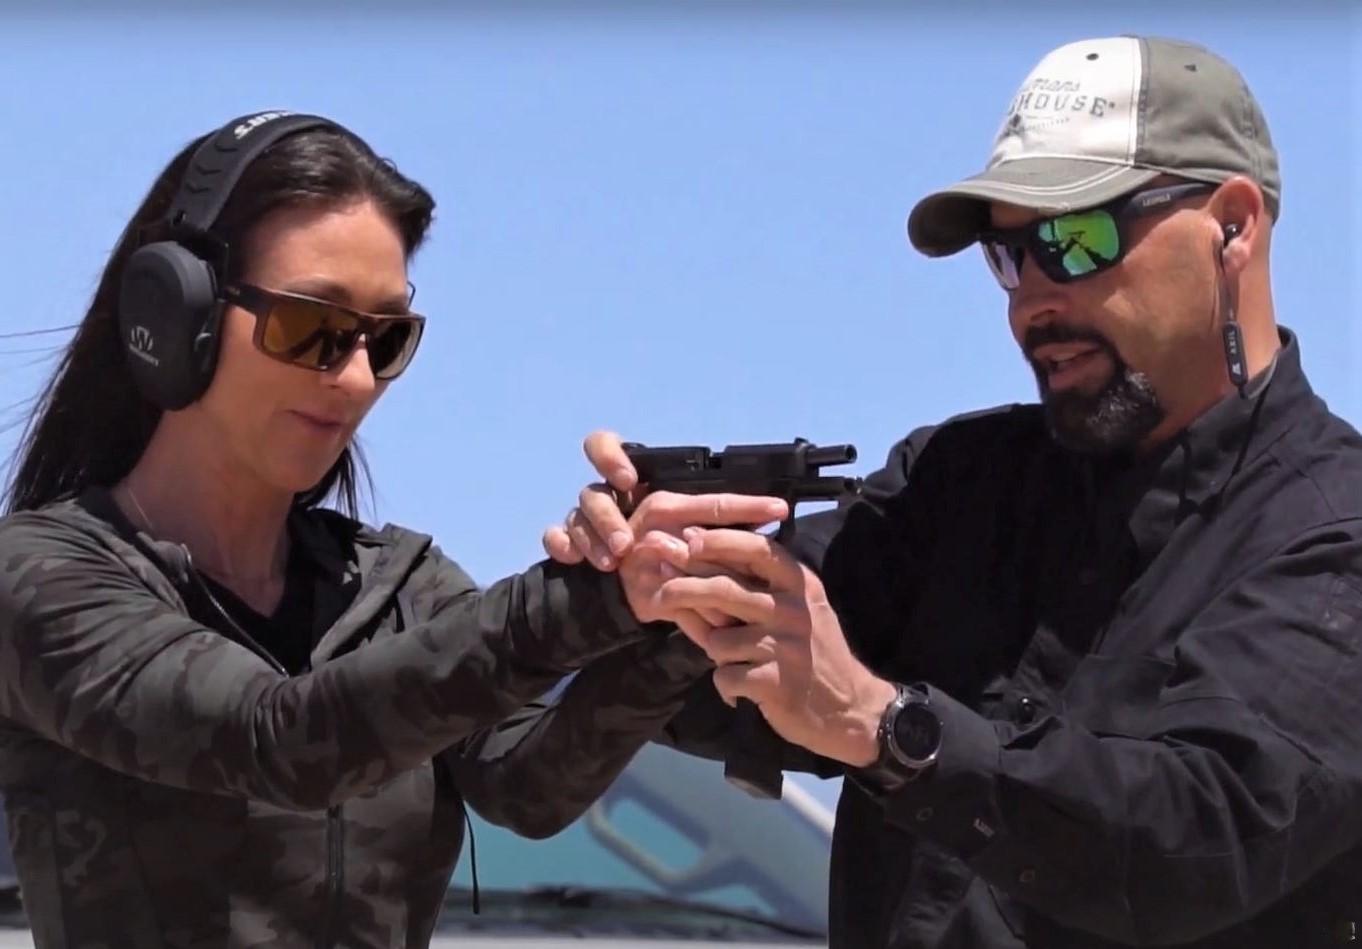 Dan Kidder training a student using a semi-automatic pistol